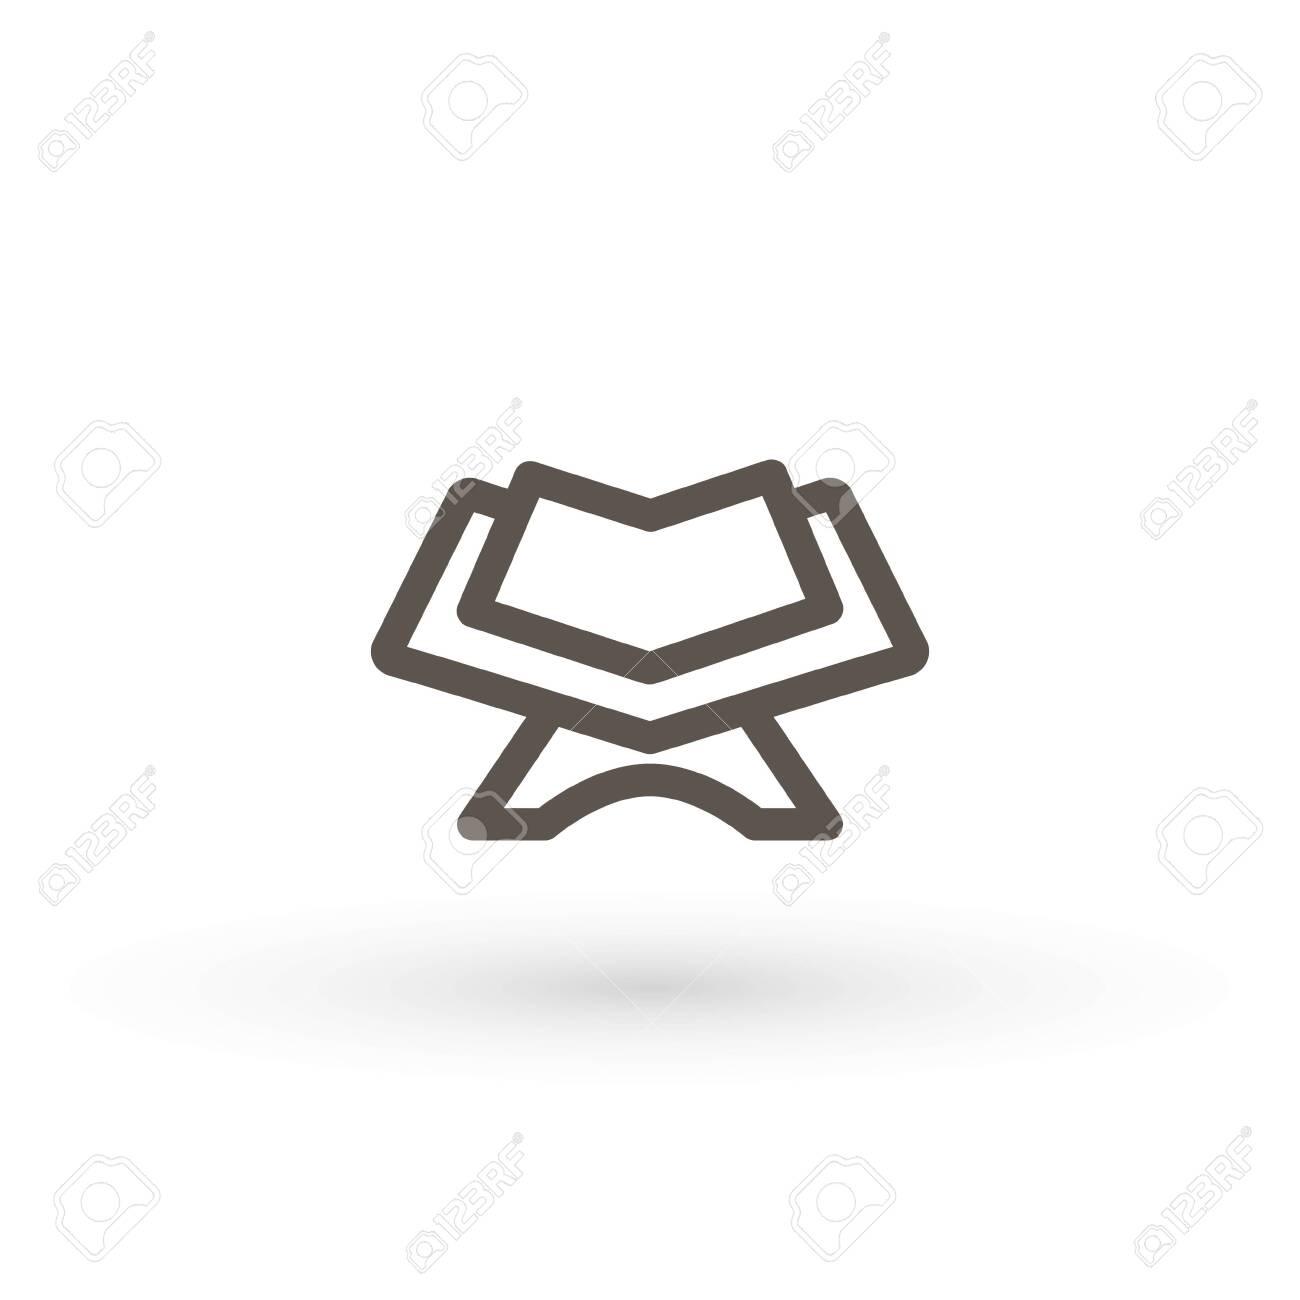 quran moslem academy logo icon vector koran islam islamic muslim royalty free cliparts vectors and stock illustration image 144354399 quran moslem academy logo icon vector koran islam islamic muslim